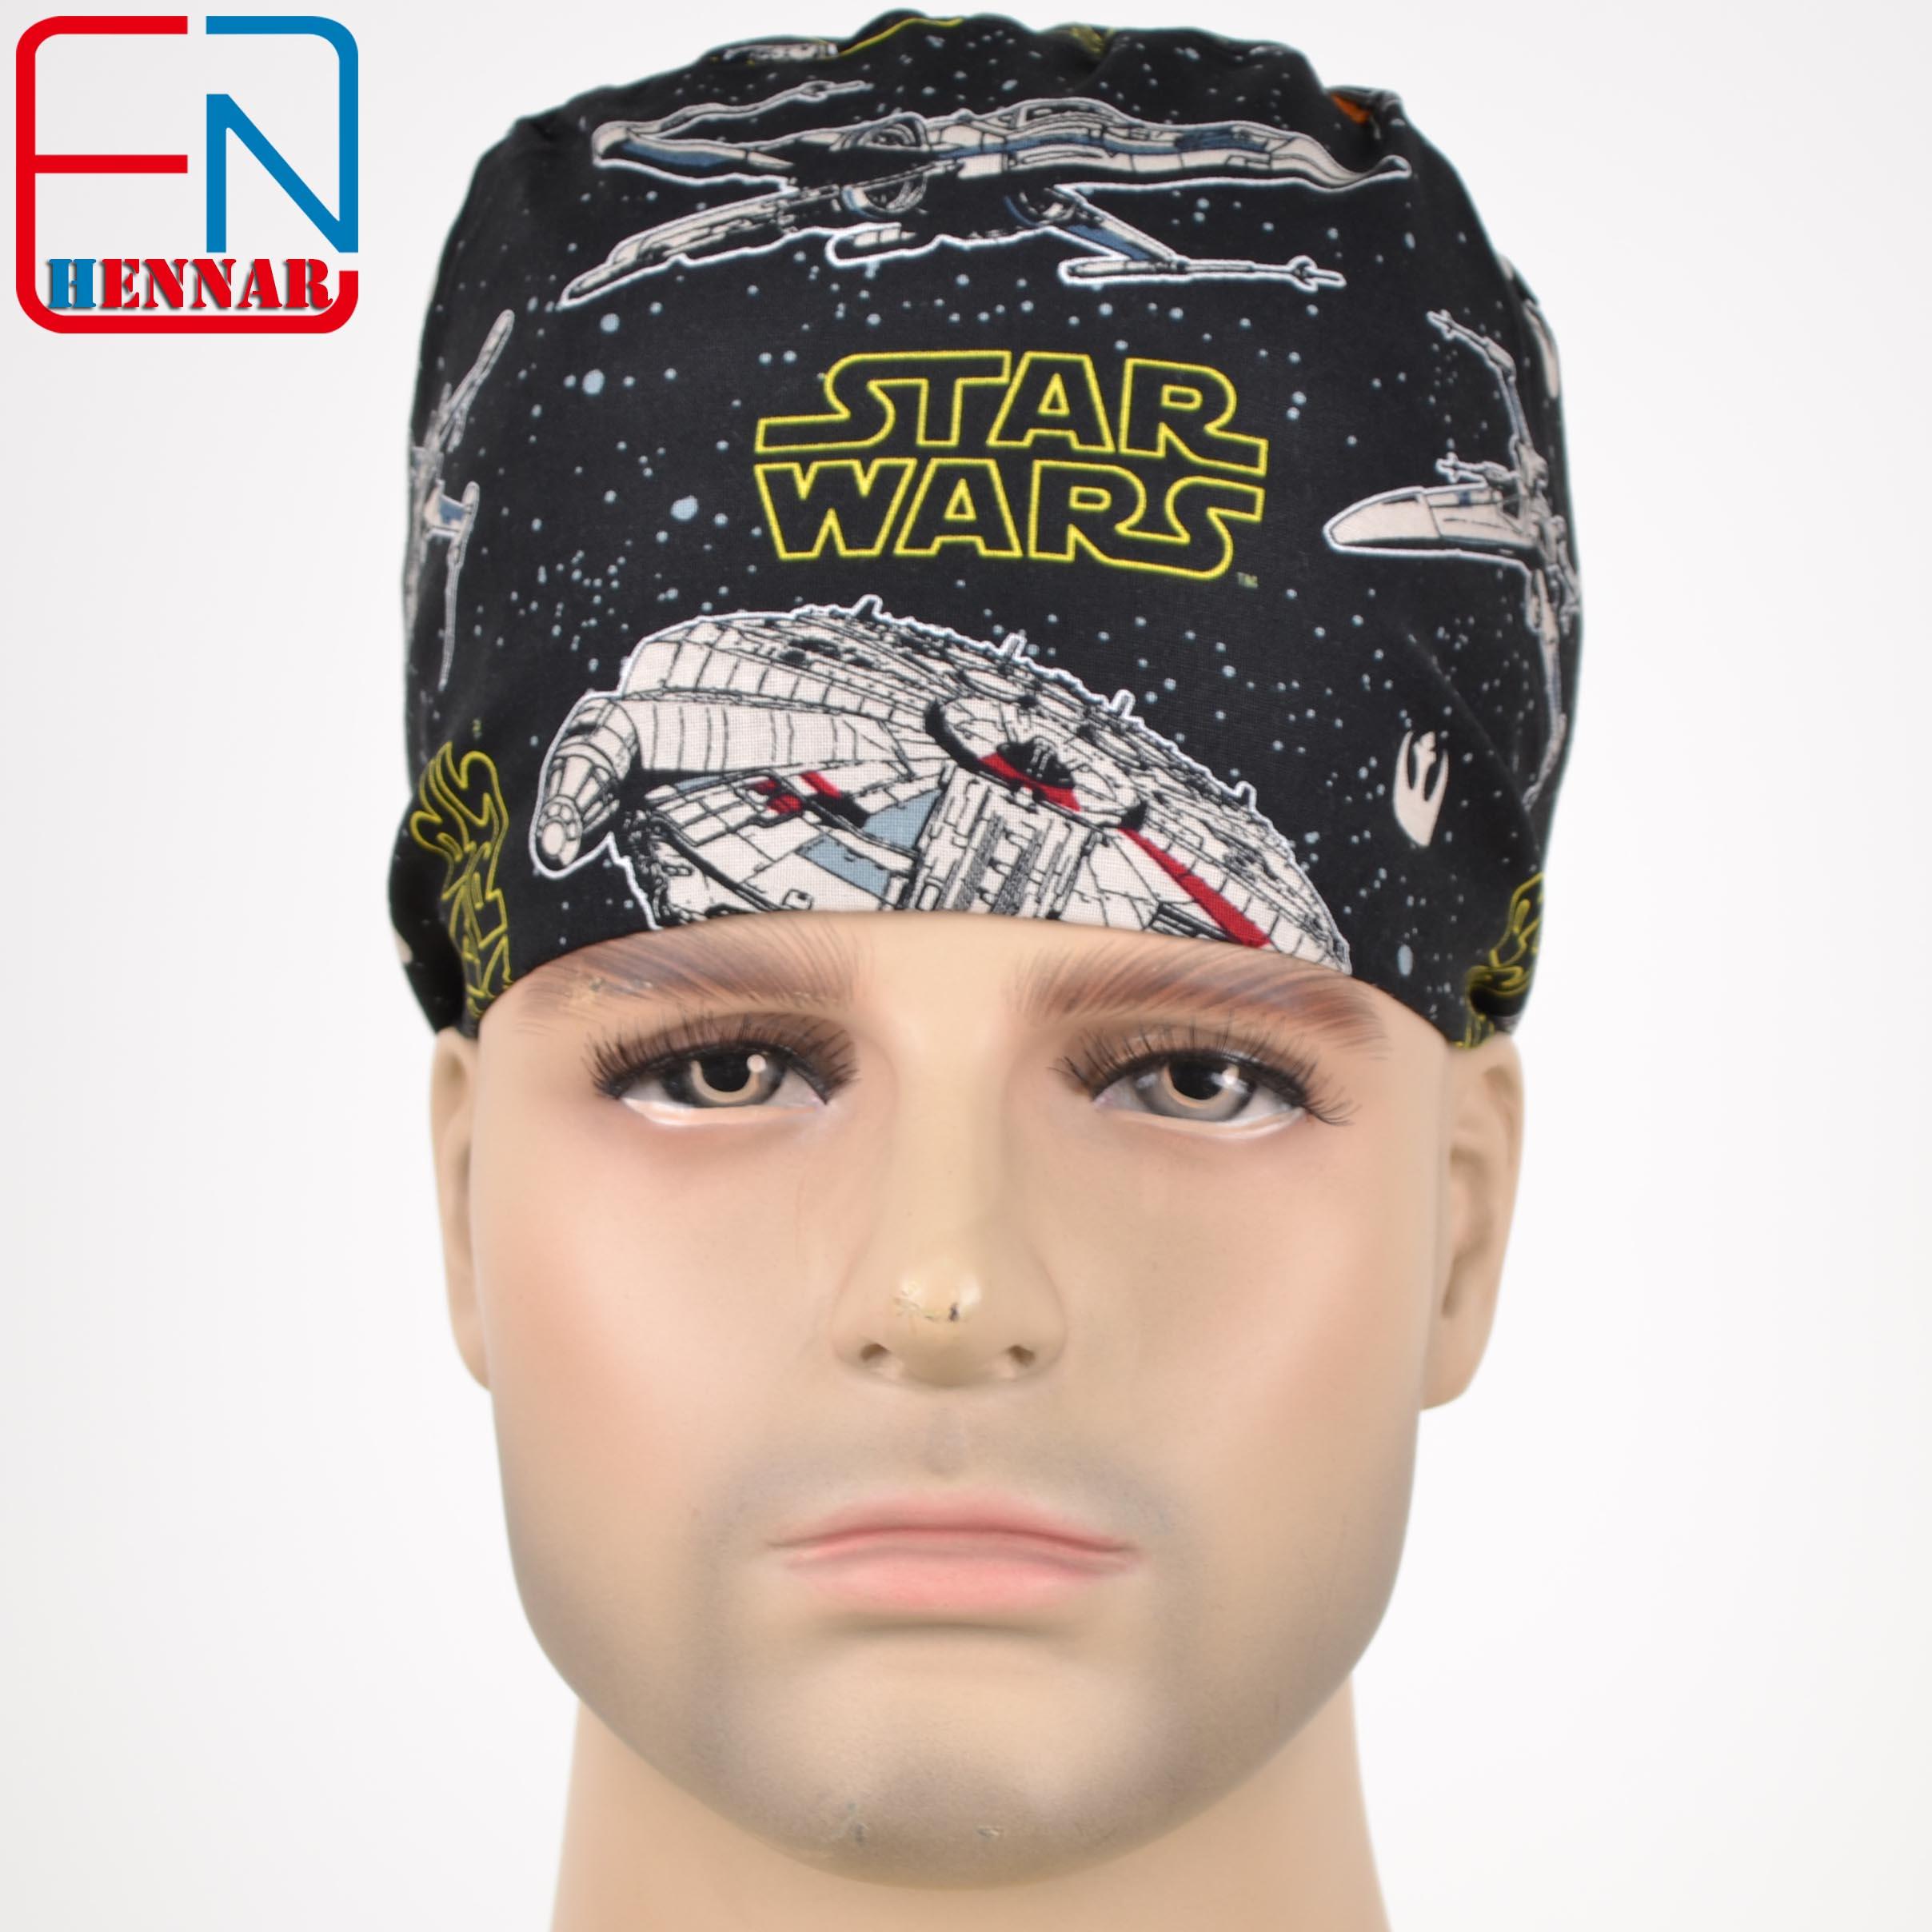 Hennar Men's Scrub Caps , 100% Cotton Adjustable Elastic Bands Surgical Scrub Caps Medical Hospital Doctor Headwear Cap ,